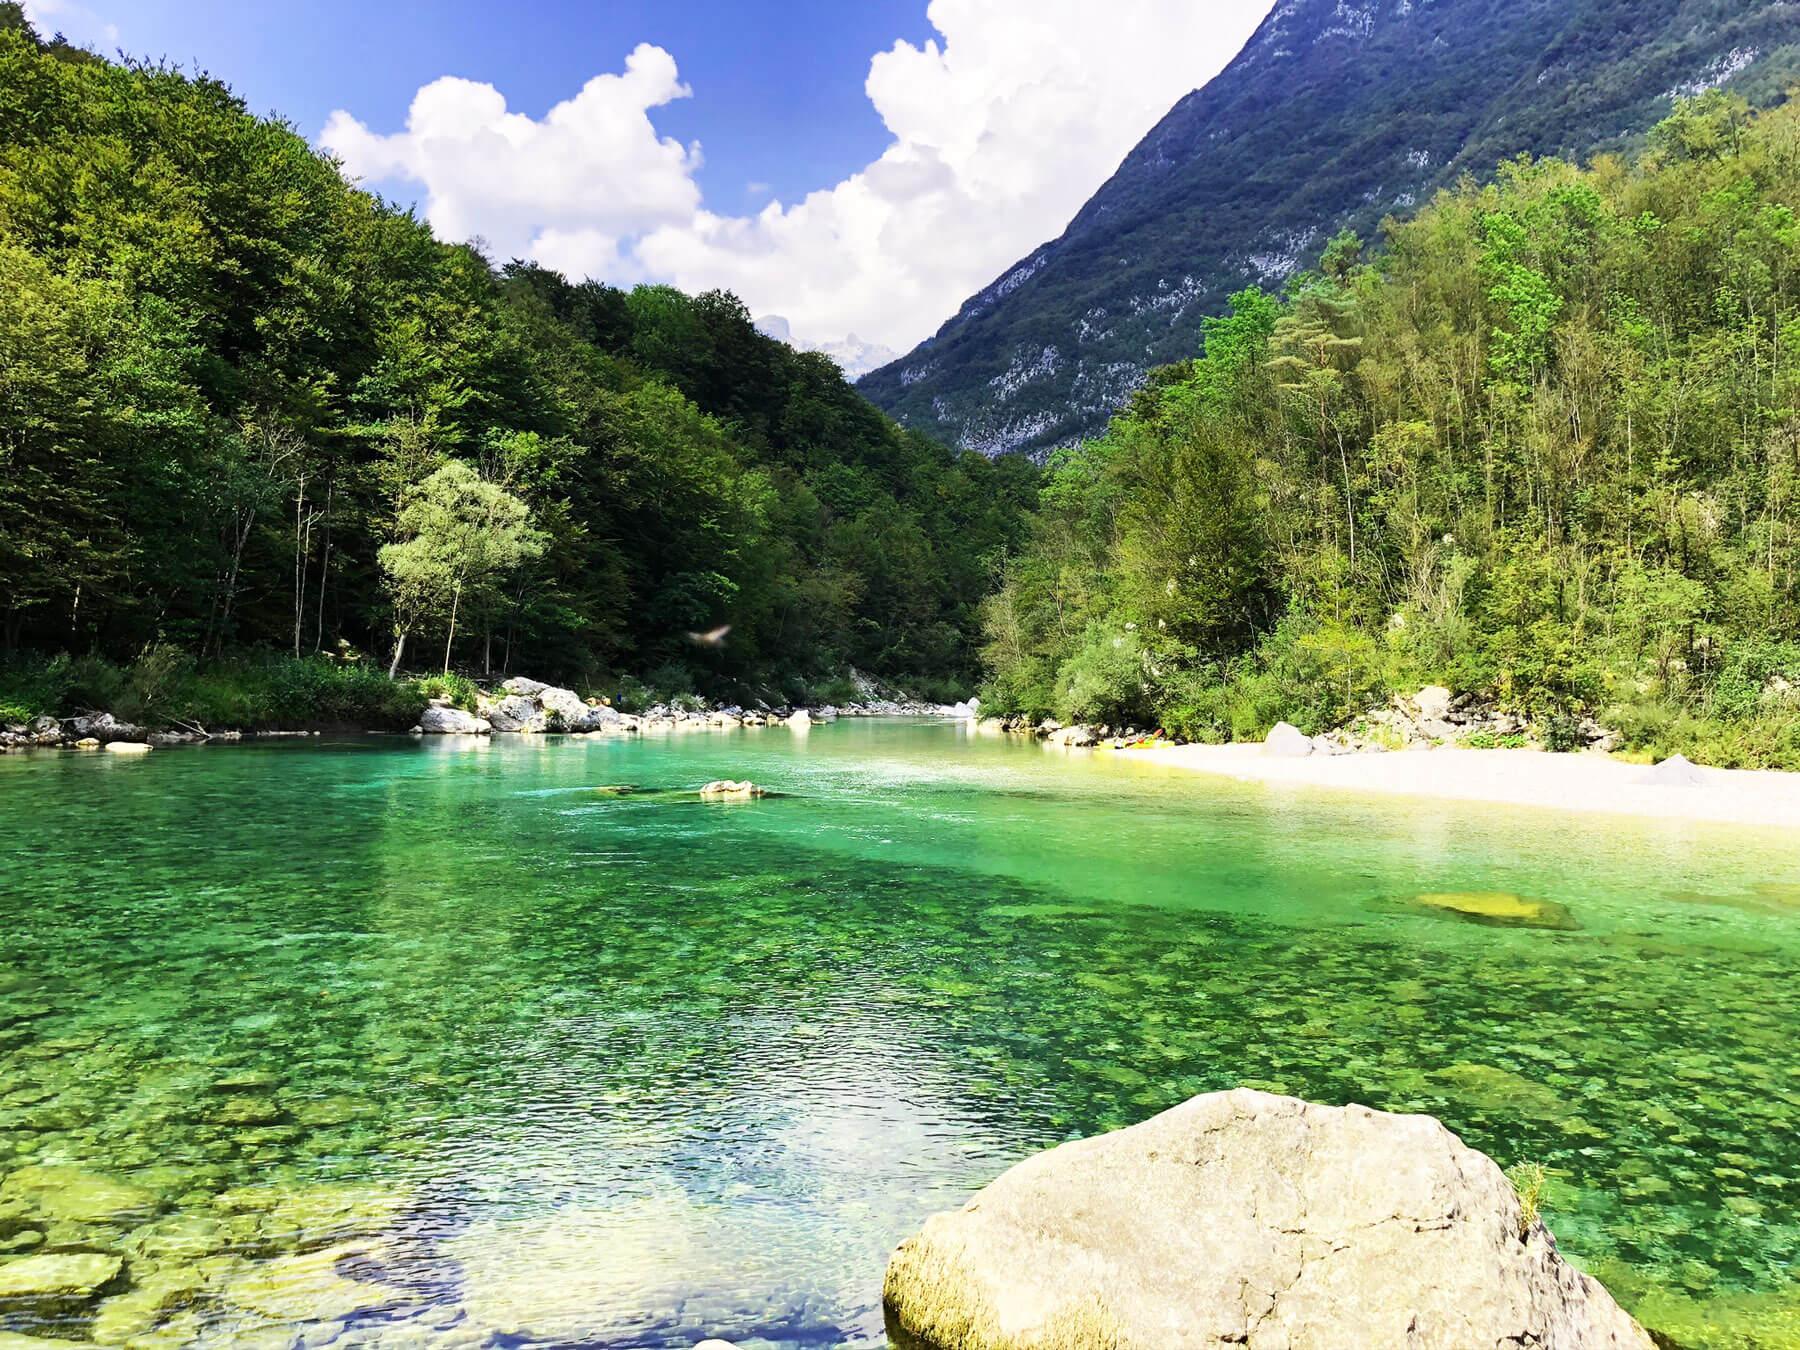 Tipps Soca Biken Wandern Campen I alpinonline